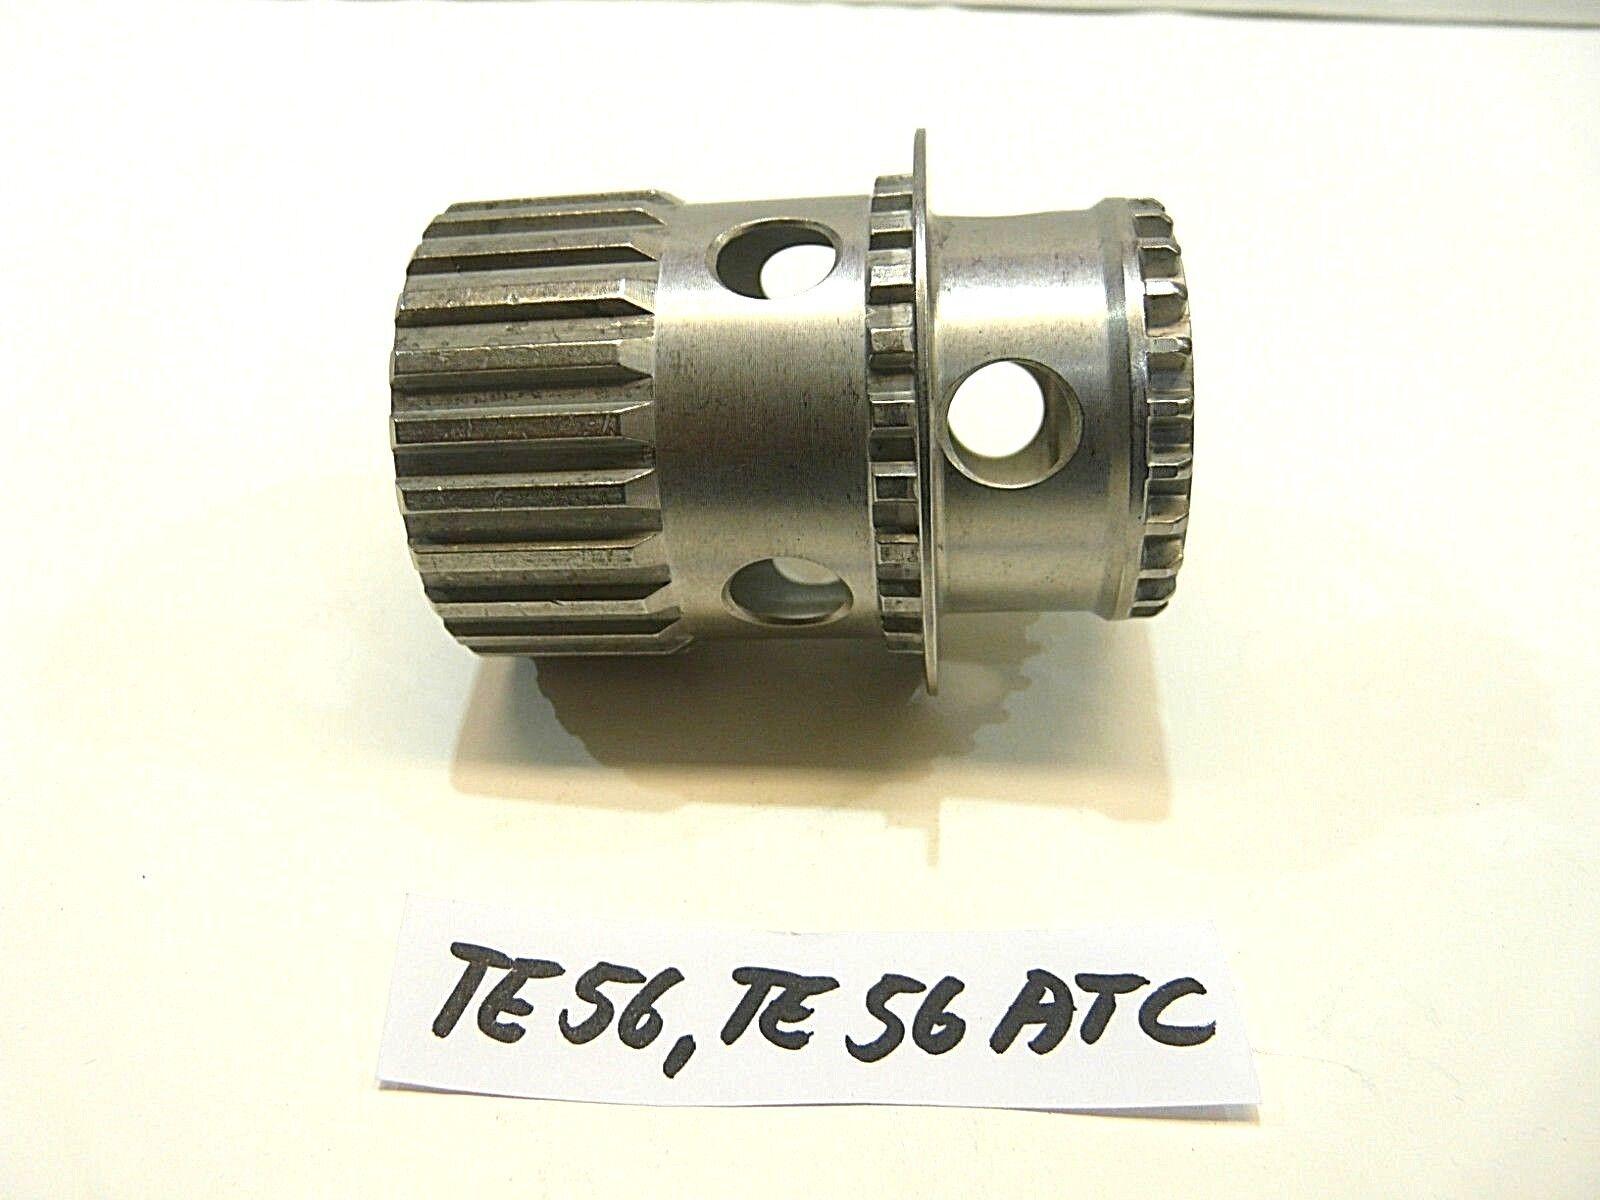 Hilti TE 56, TE 56 ATC ,  Muffe (366238.63)   NEU